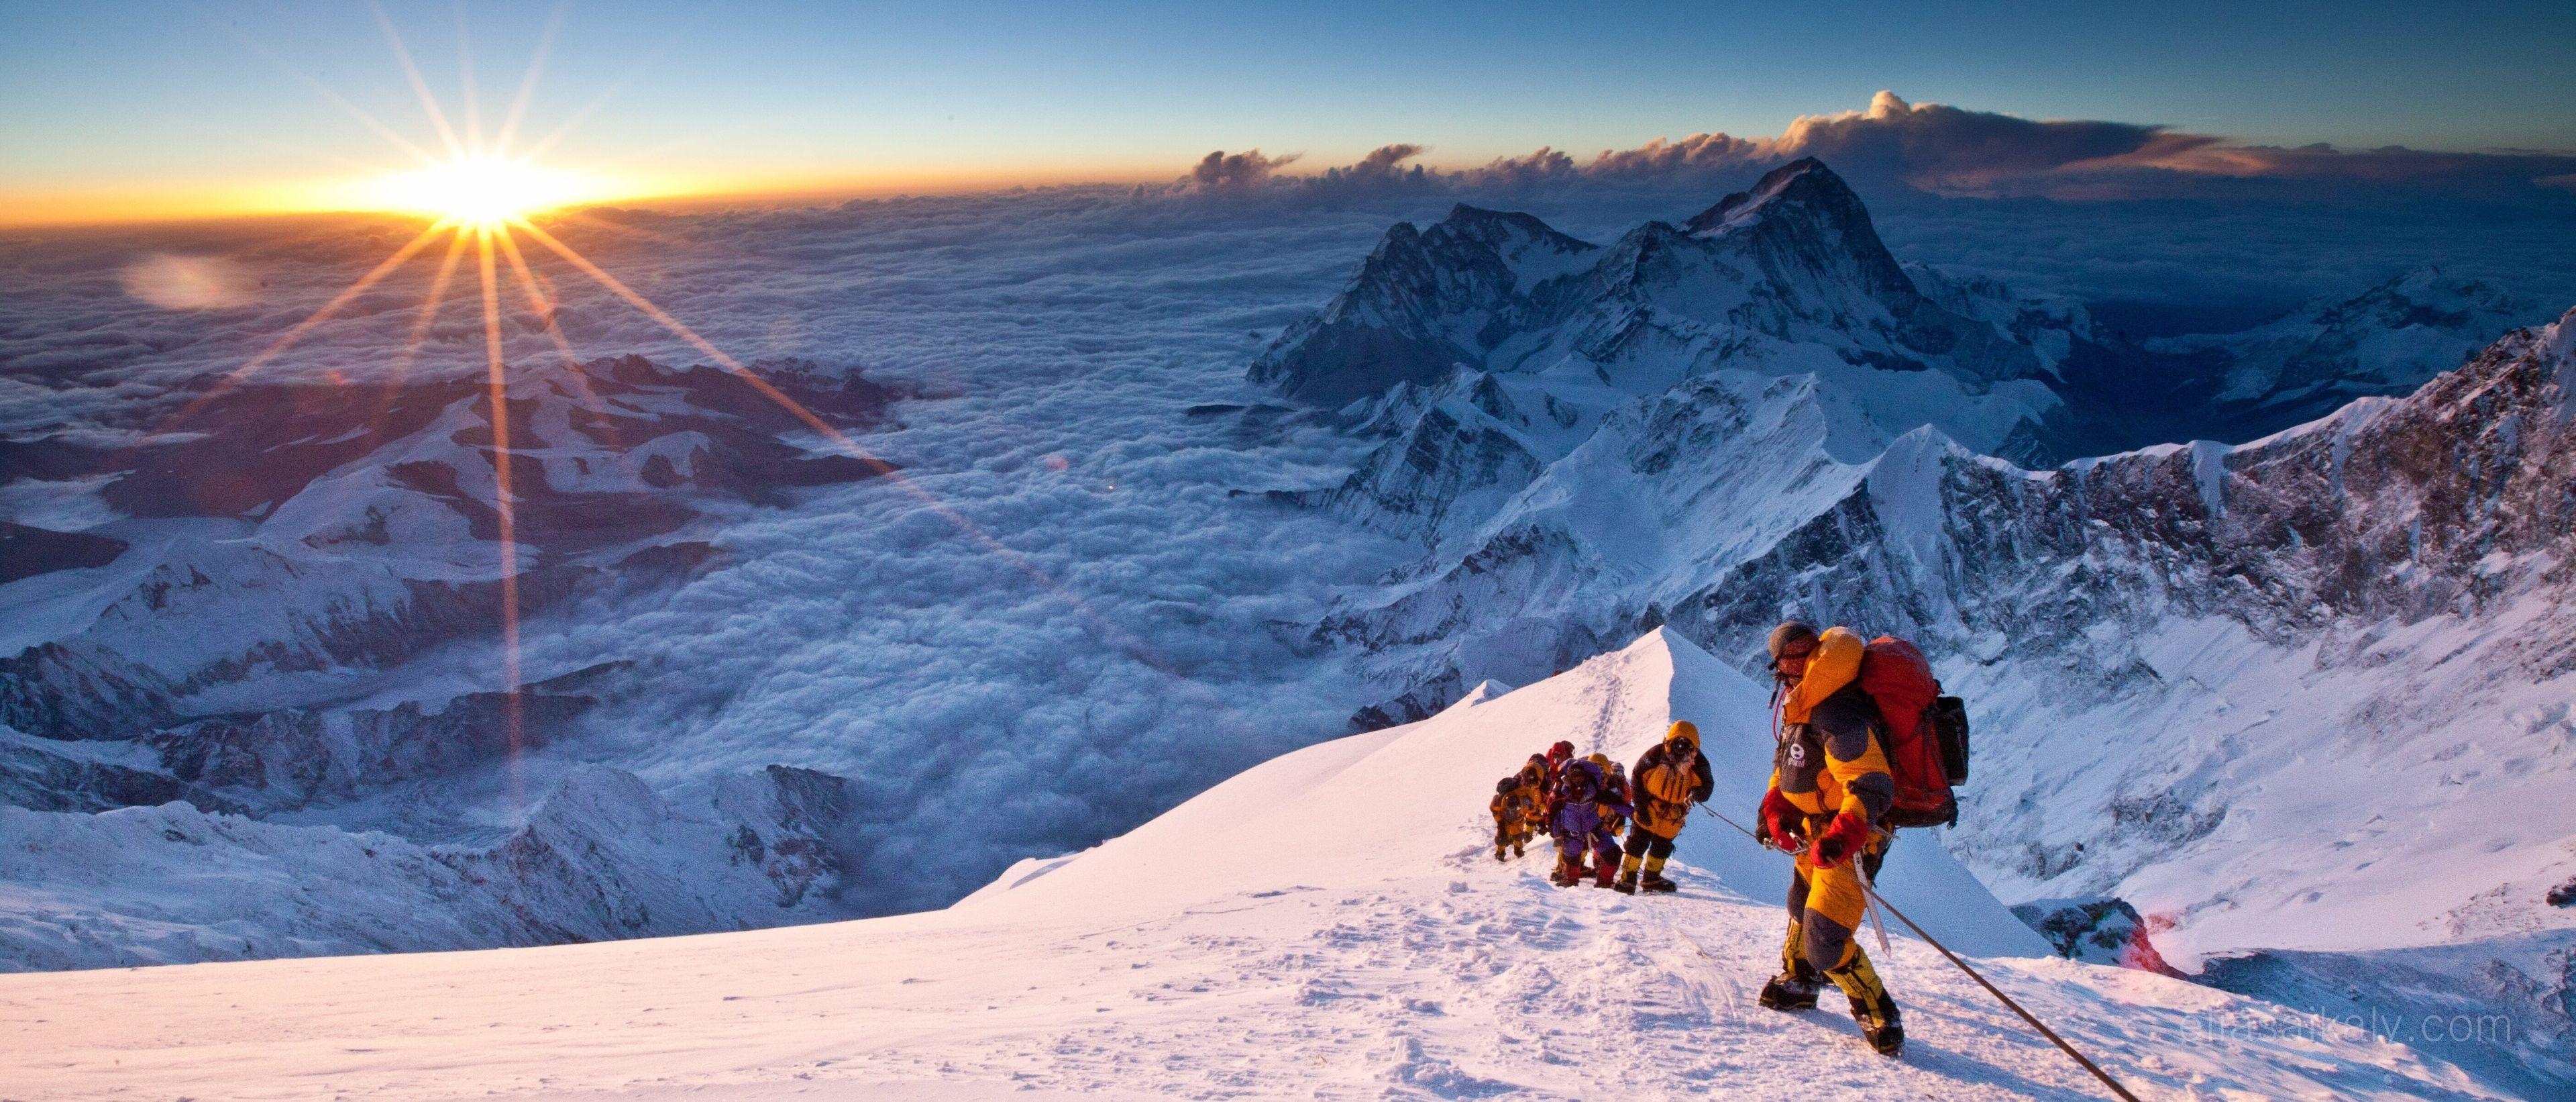 Mount Everest 4k Wallpaper Posted By Christopher Peltier